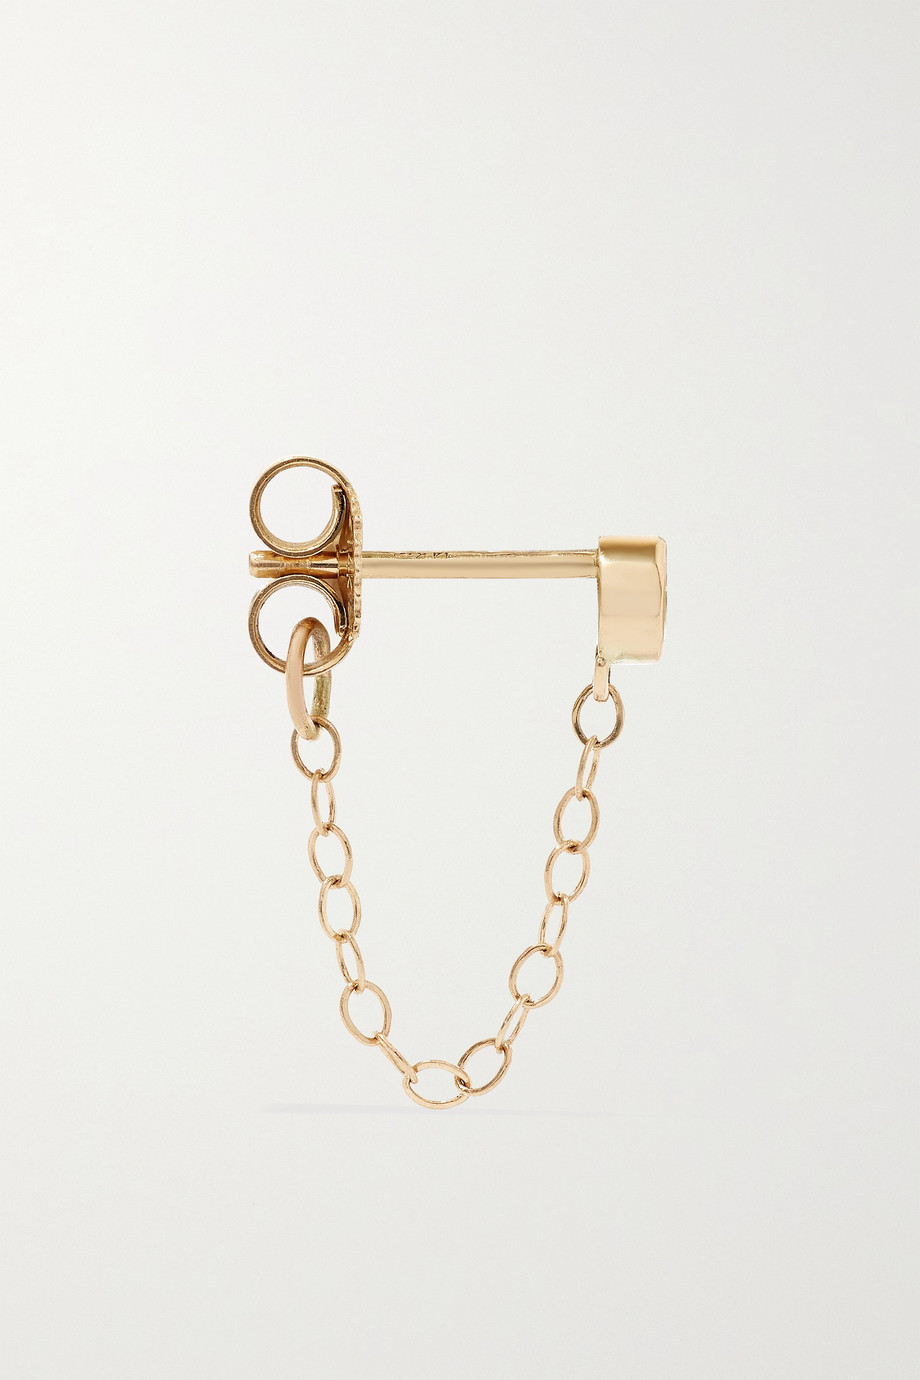 Melissa Joy Manning 14-karat recycled gold emerald earrings